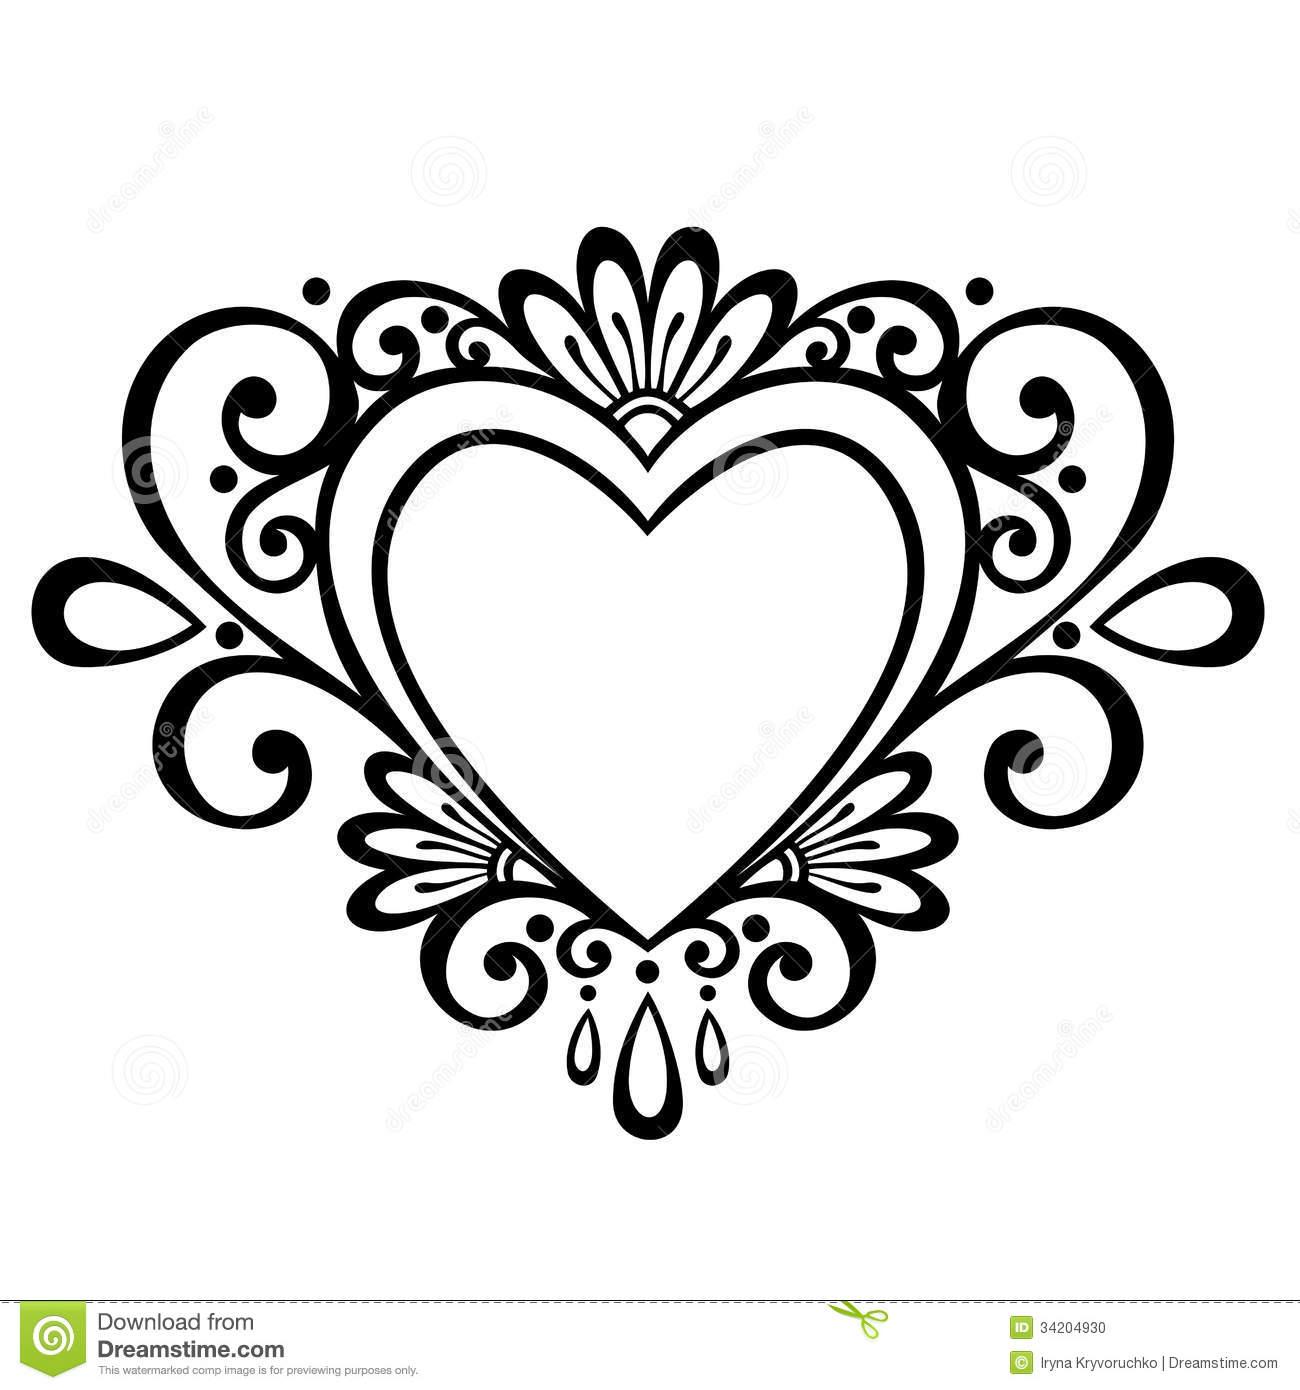 12 Double Heart Vector Art Images